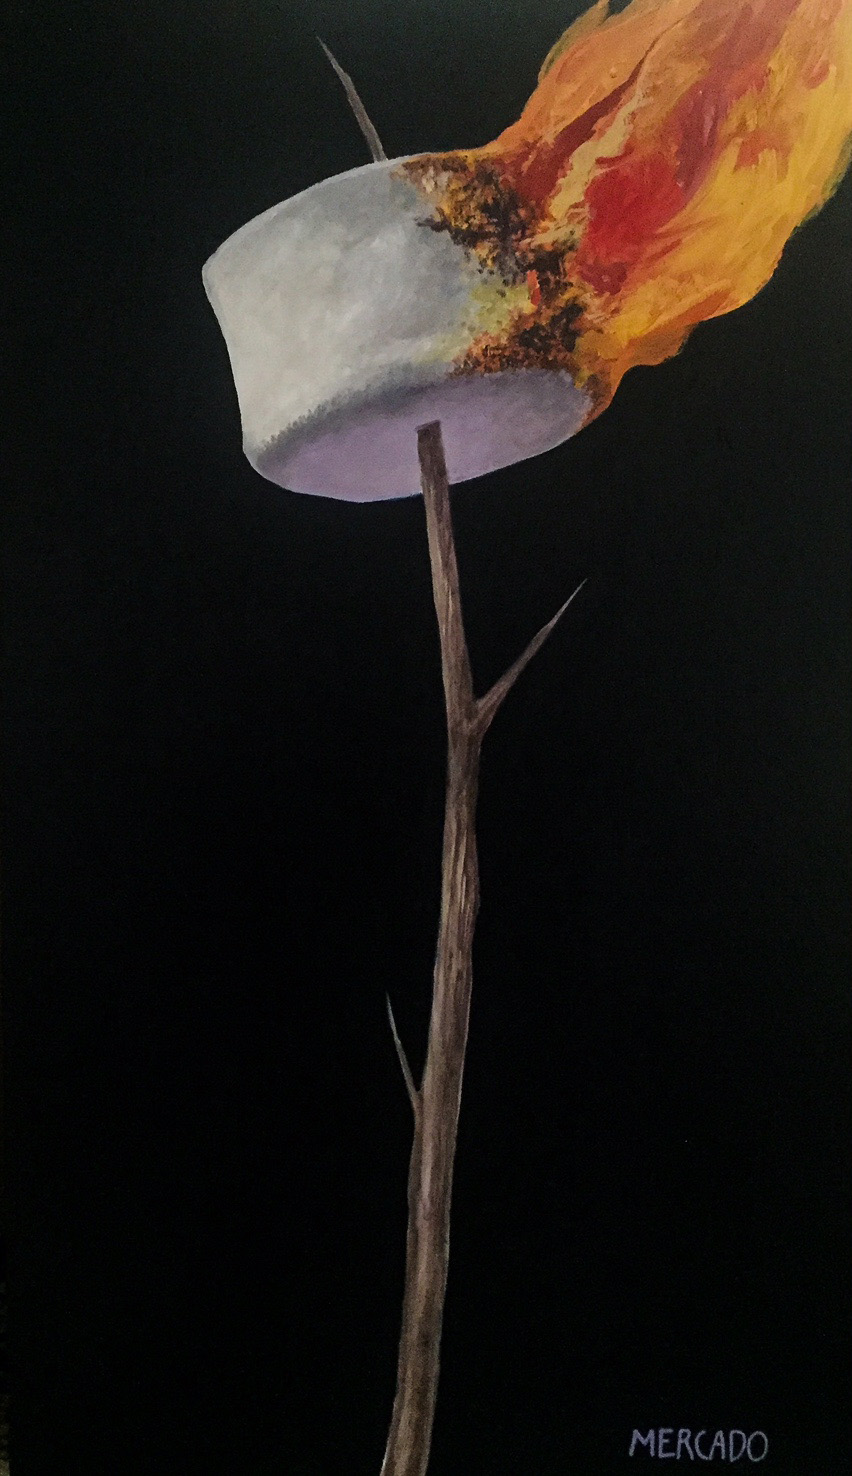 Marshmallow Flambe